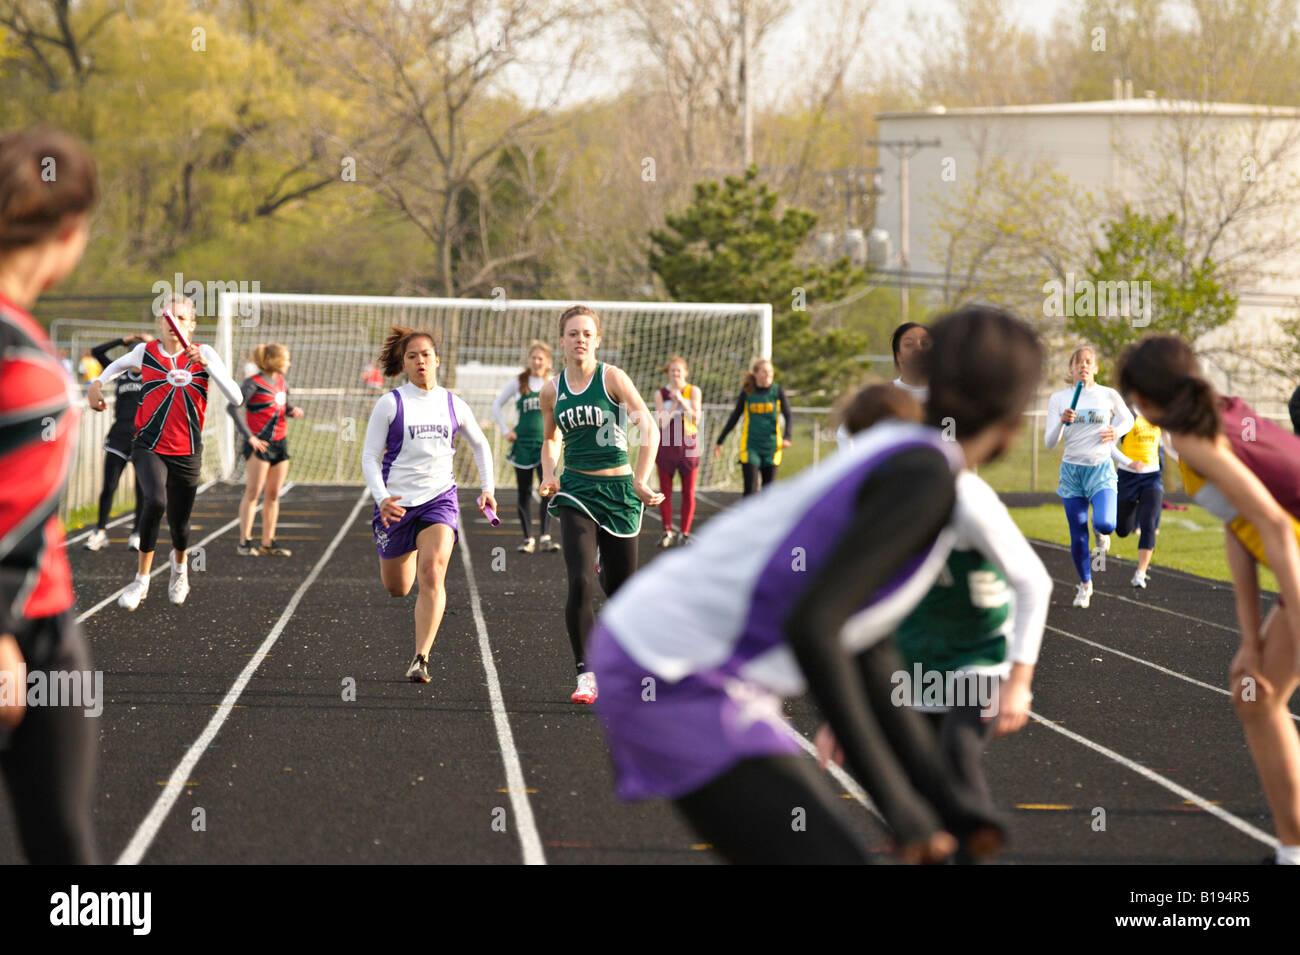 TRACK Glenview Illinois Sprinters await handoff from teammate relay race High school girls track meet - Stock Image